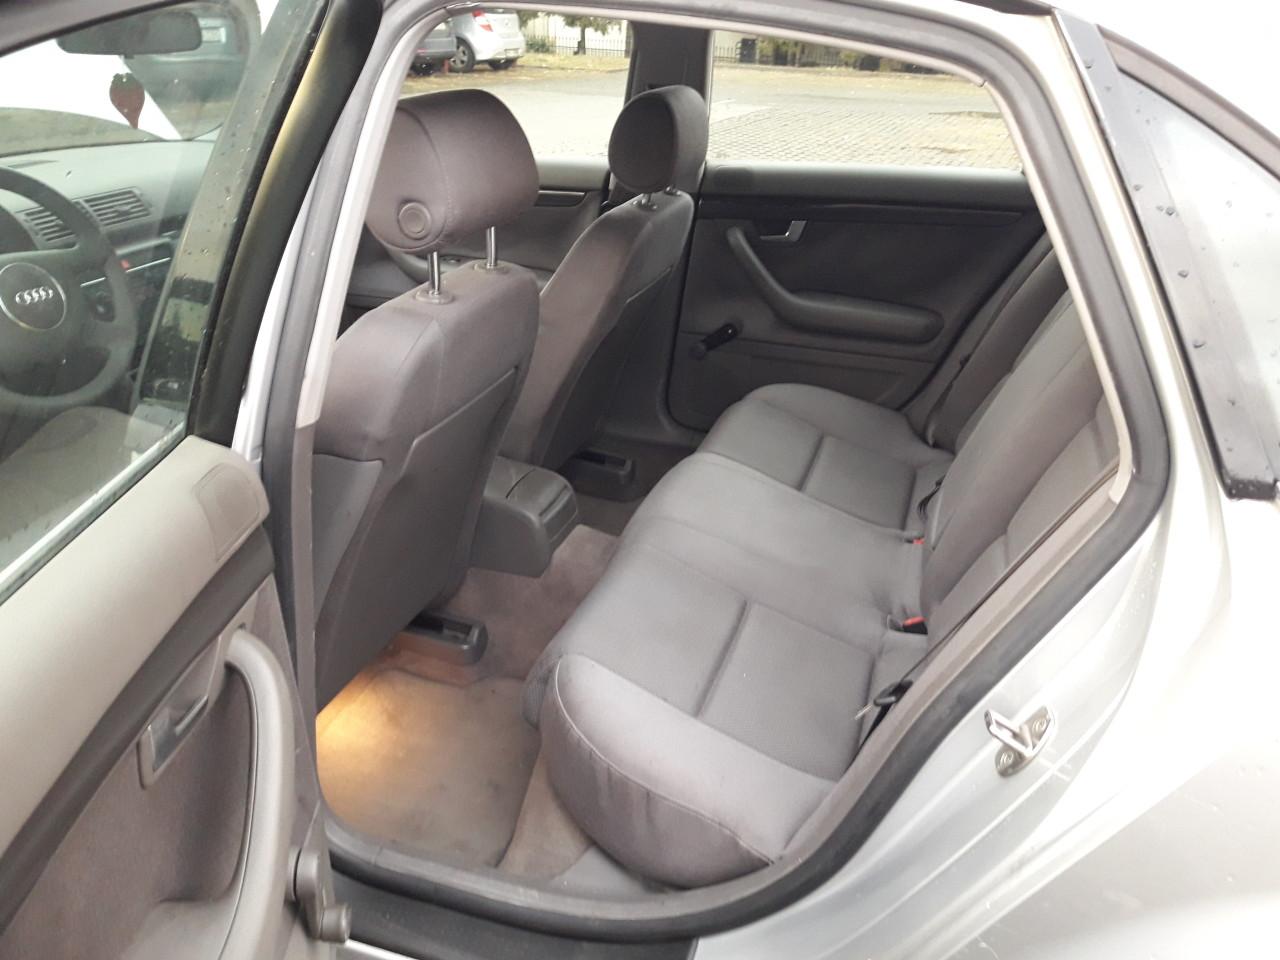 Dezmembrez AUDI A4 B6, berlina, motor 2.0(1984cmc) ALT, Benzina 130 CP, 2001,CVM 5 tr, Argintiu LY7W